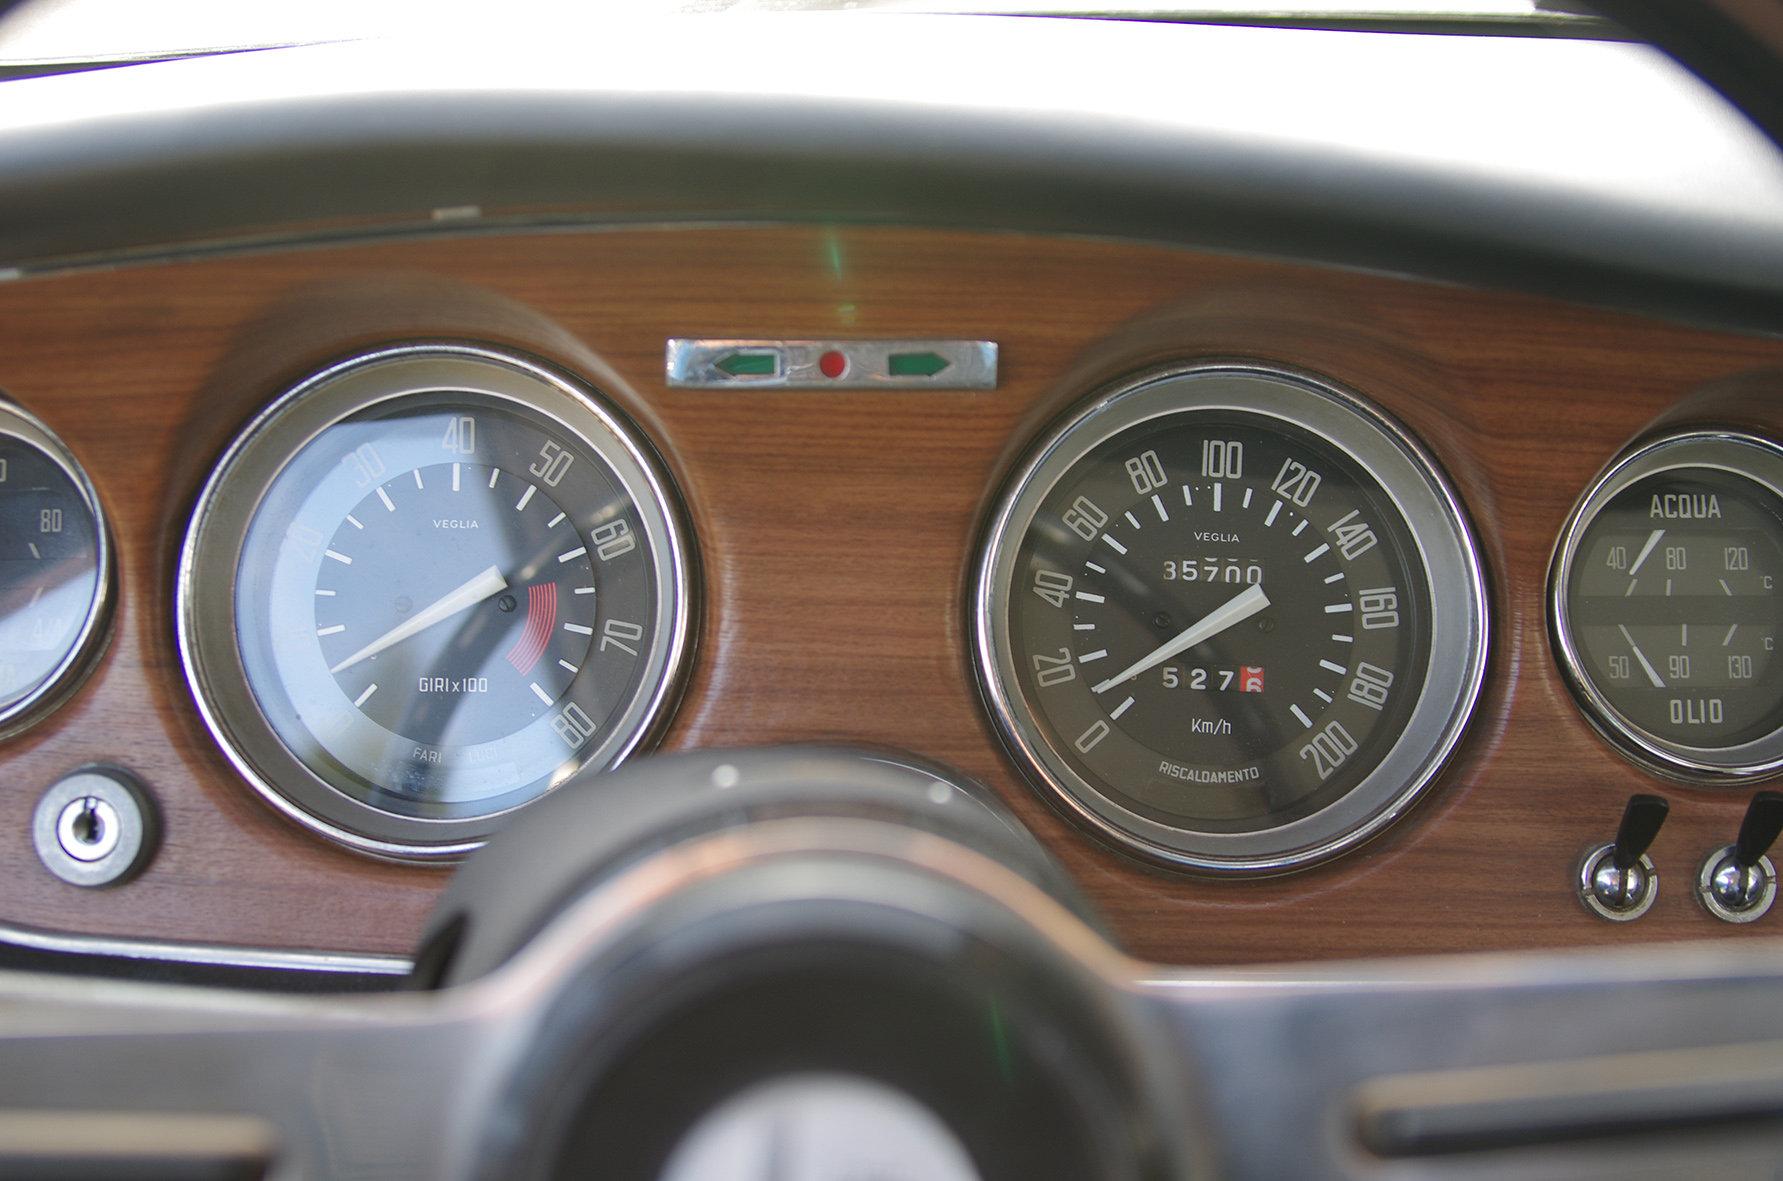 1967 Alfa Romeo Giulia GT 1300 Junior *restored* UK delivery poss SOLD (picture 4 of 6)